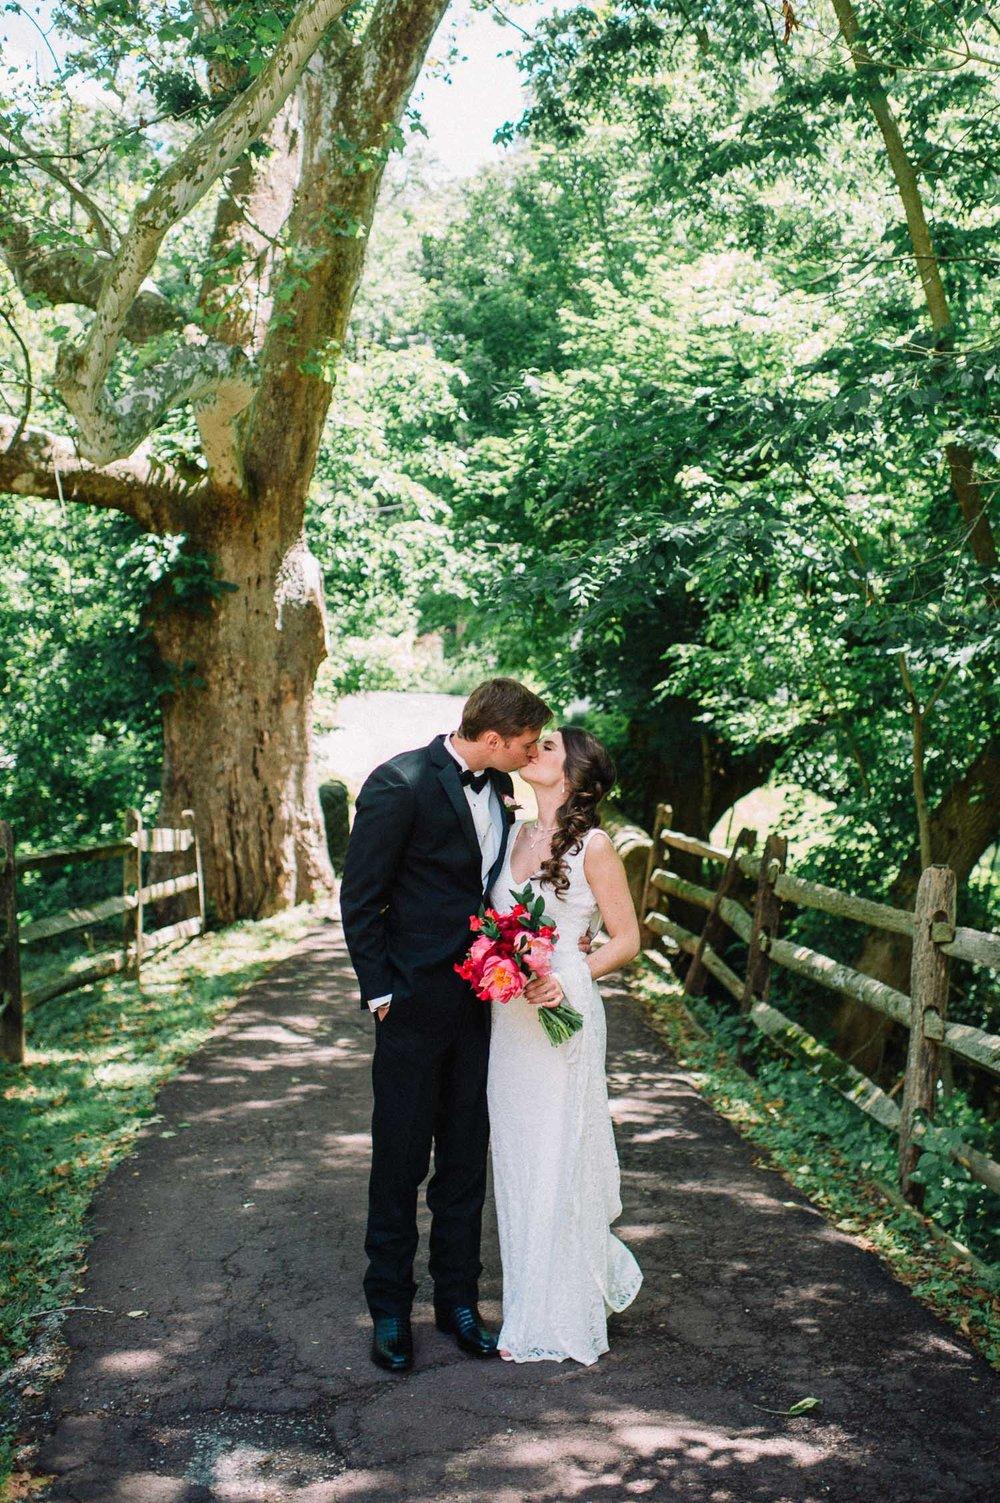 Jessie bandy wedding